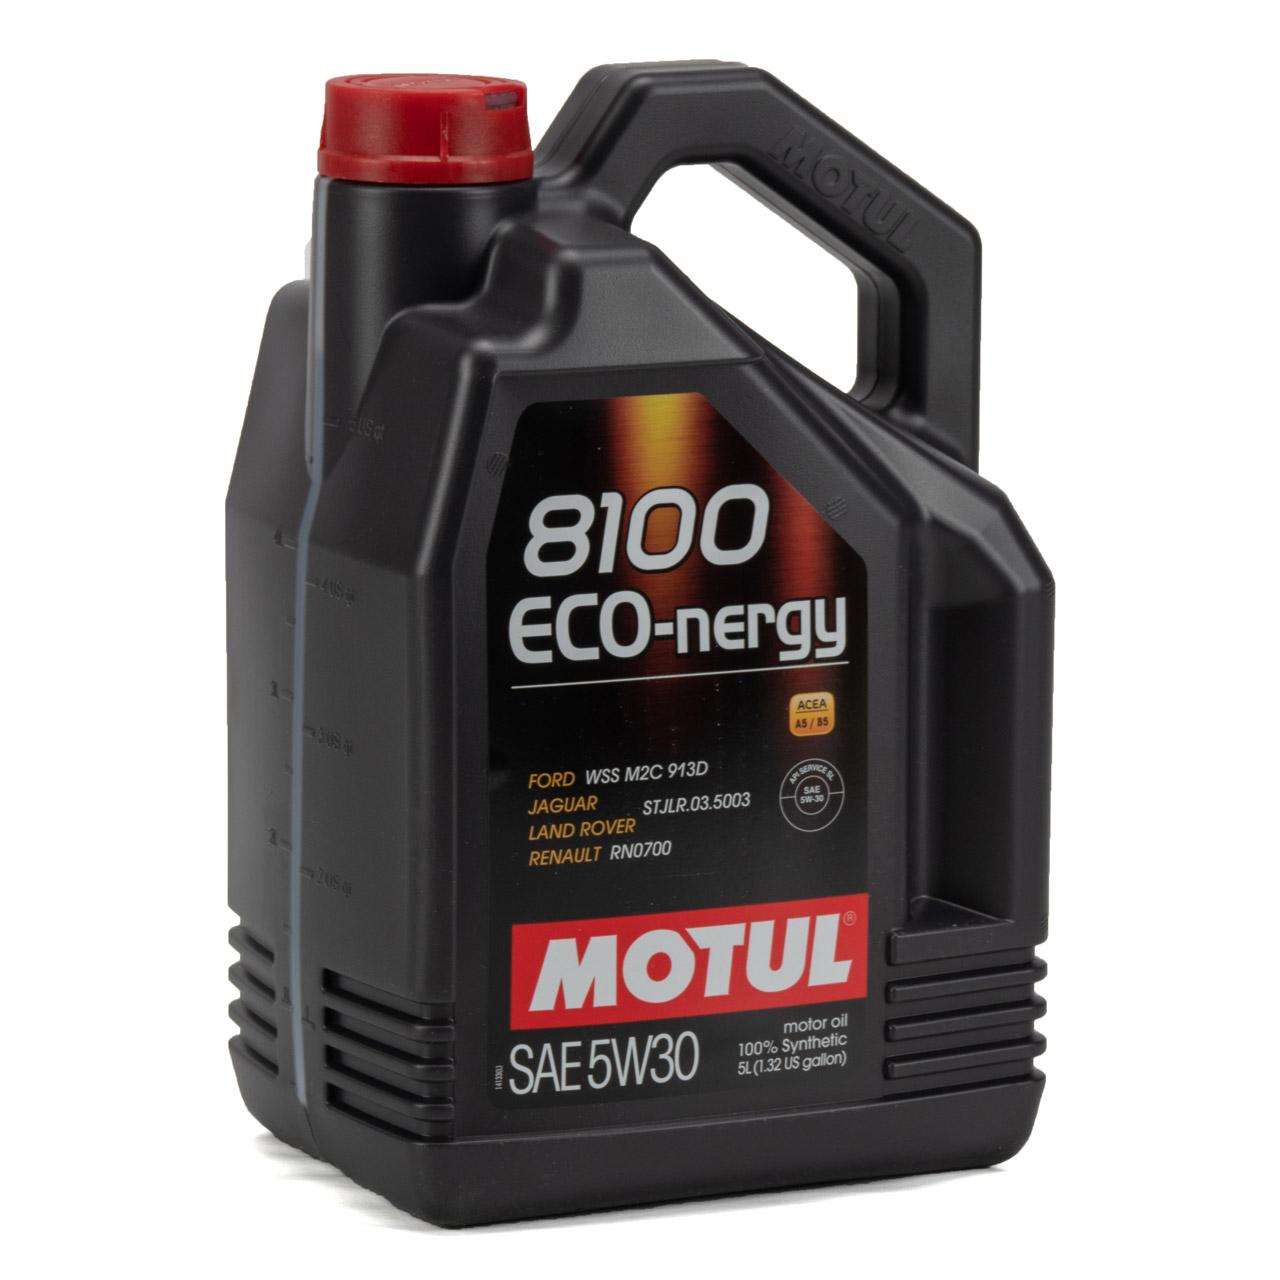 MOTUL 8100 ECO-nergy Motoröl Öl 5W30 FORD WSS M2C 913D RENAULT RN0700 - 10 Liter